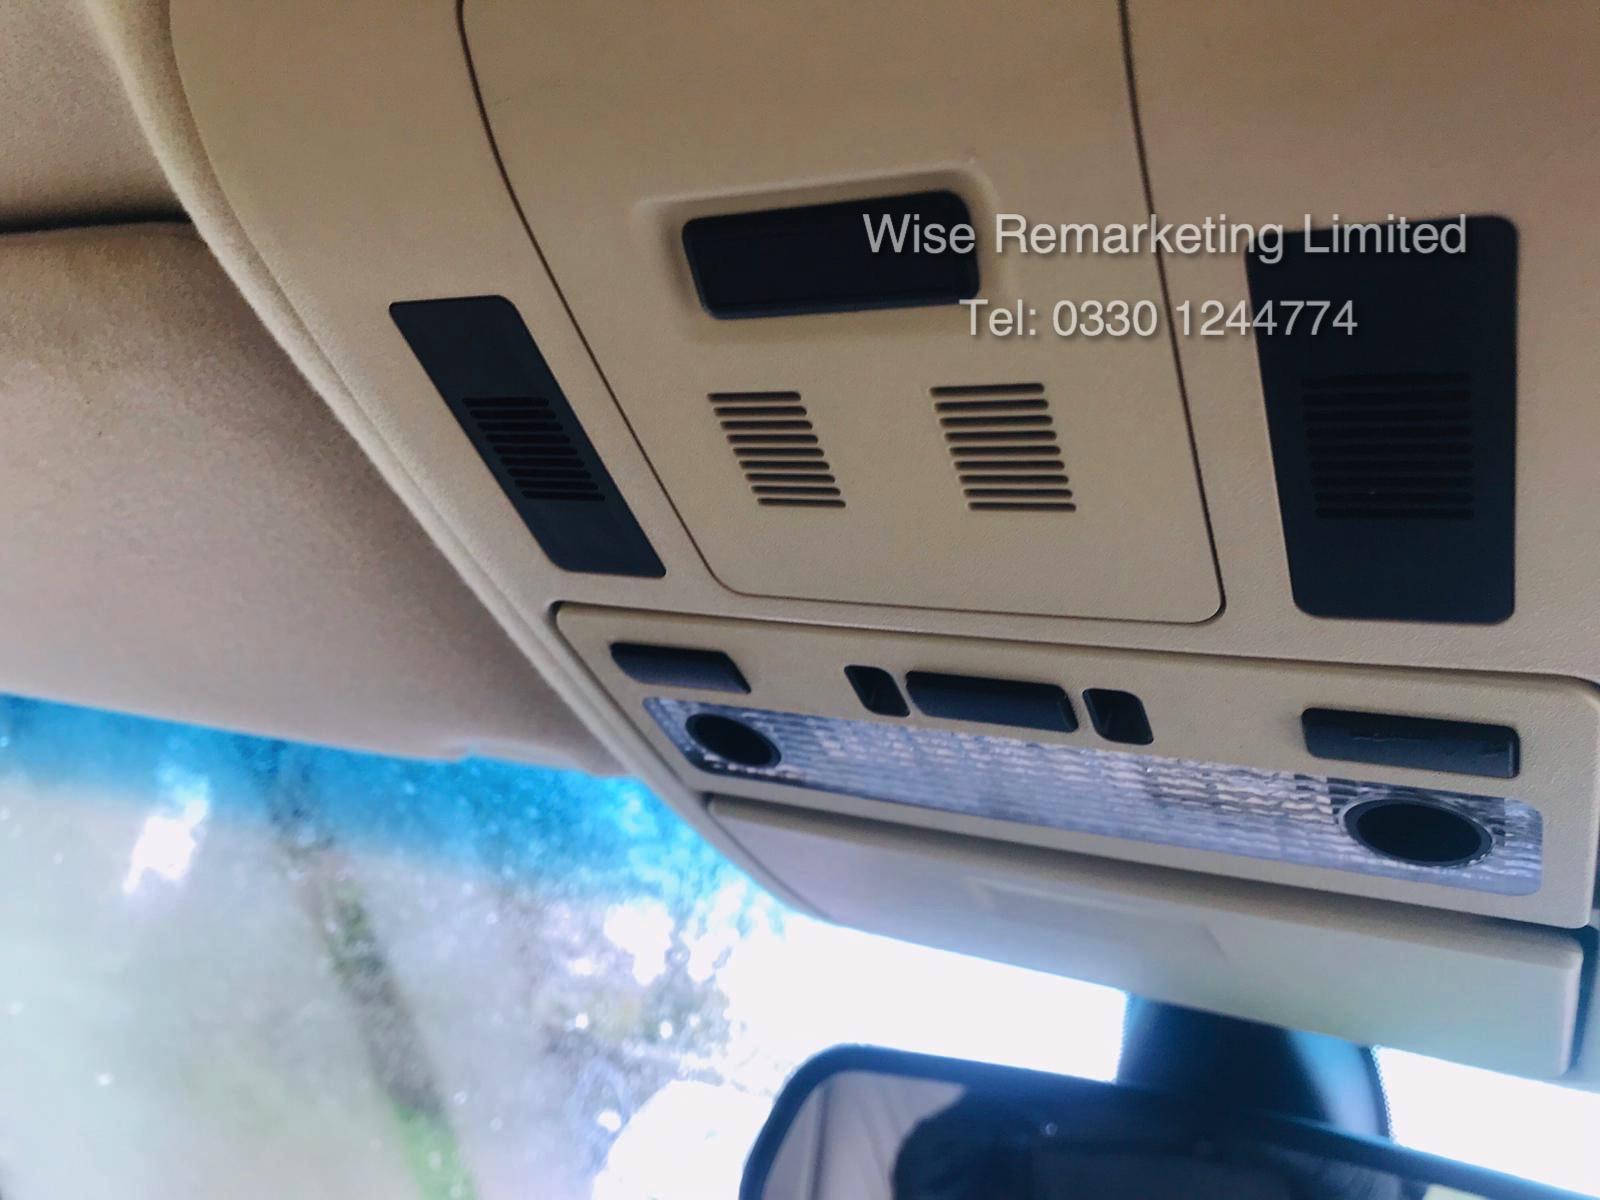 Range Rover Vogue 3.6 TDV8 HSE Auto - 2010 Model - Cream Leather - Service History - - Image 21 of 28